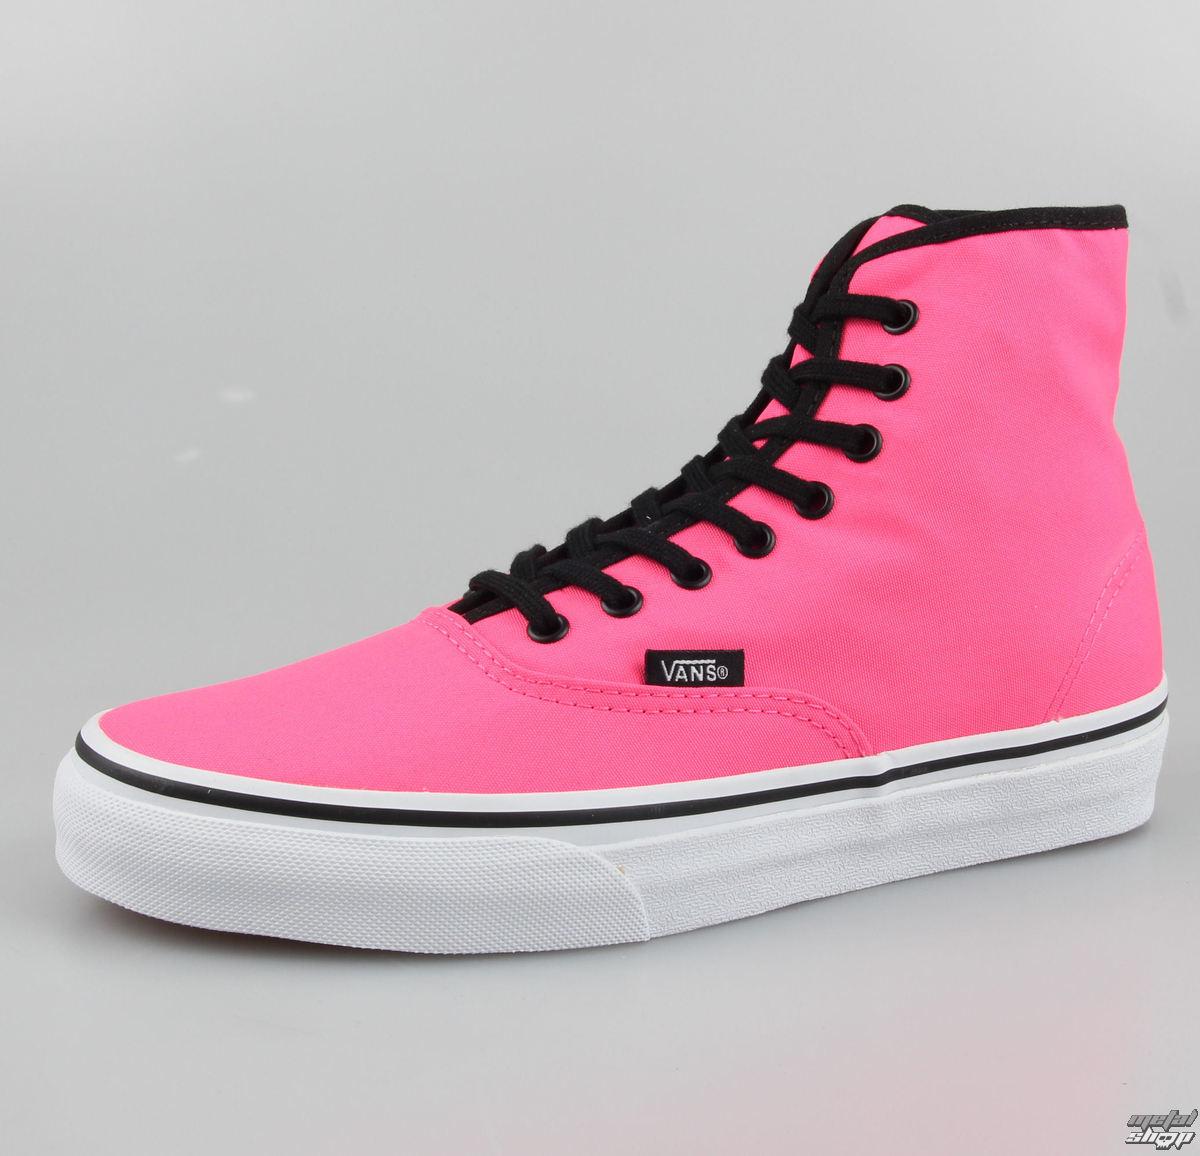 topánky VANS - Authentic HI - Neon Pink - VRQFOFR